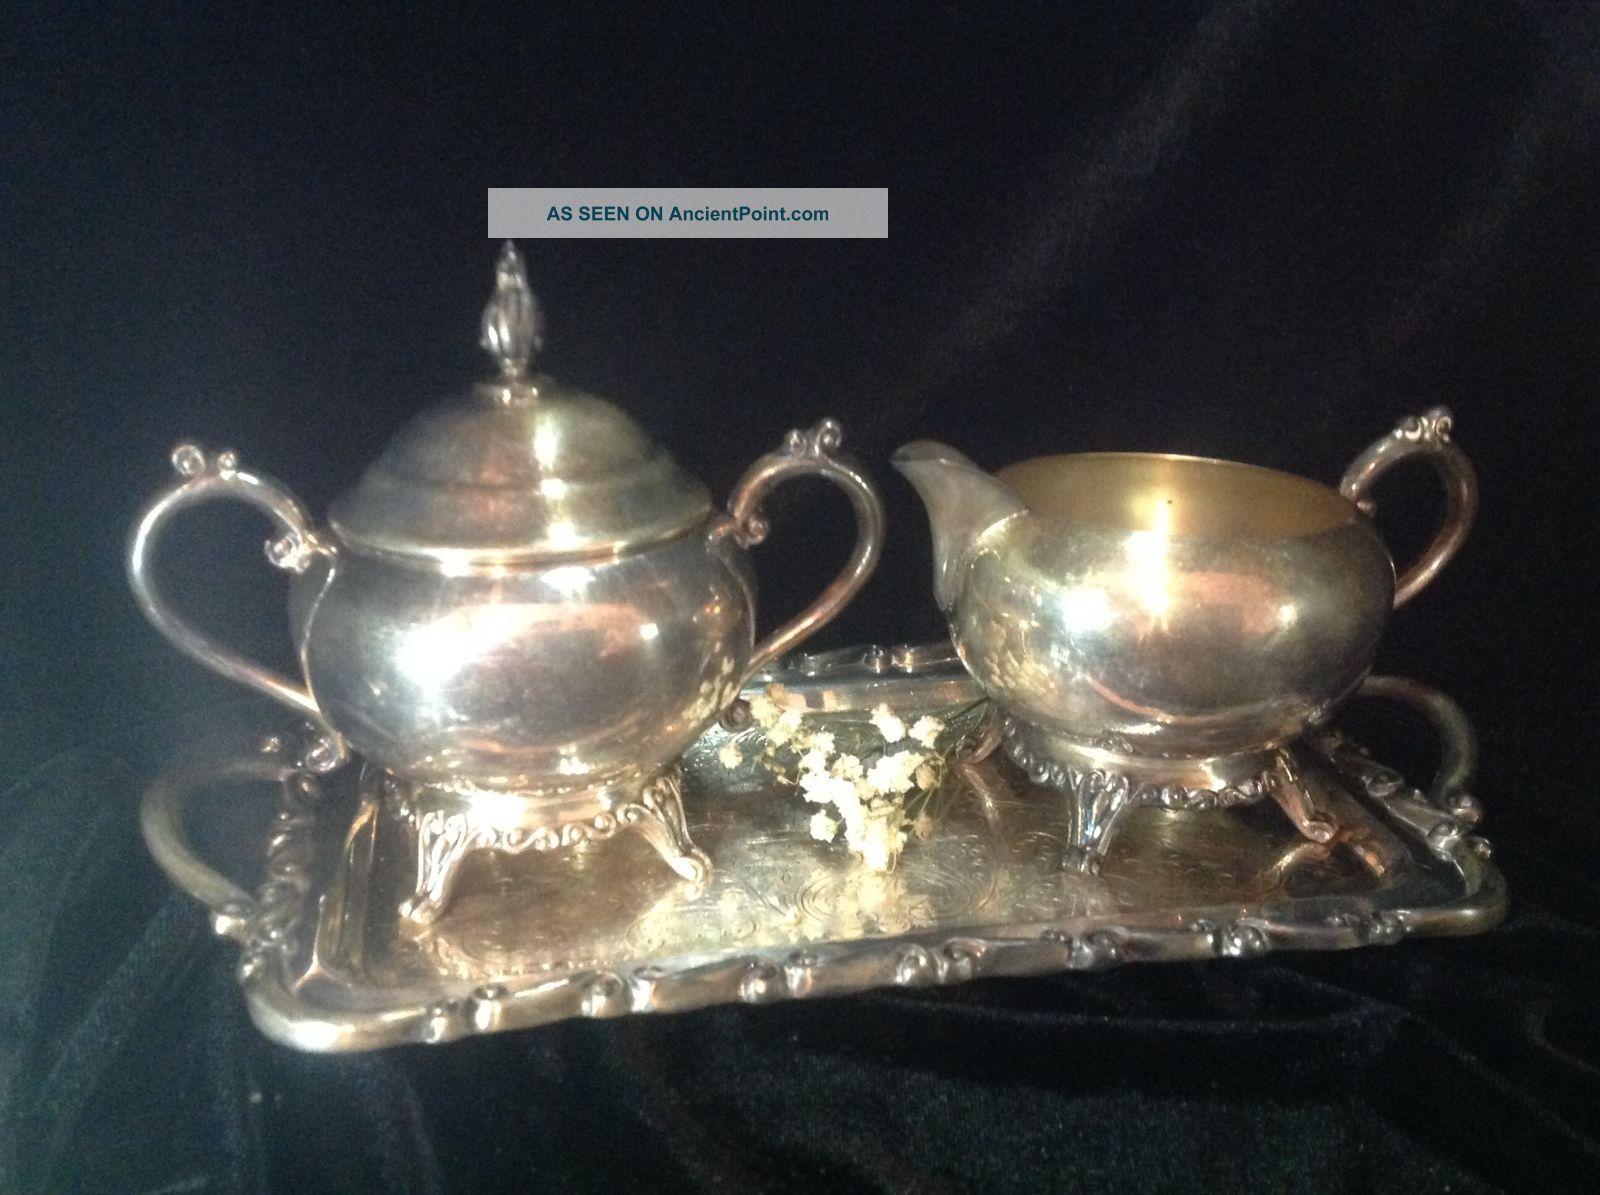 Antique Victorian Creamer Sugar F.  B.  Rogers Silver Co.  1883 Pattern 2391 Creamers & Sugar Bowls photo